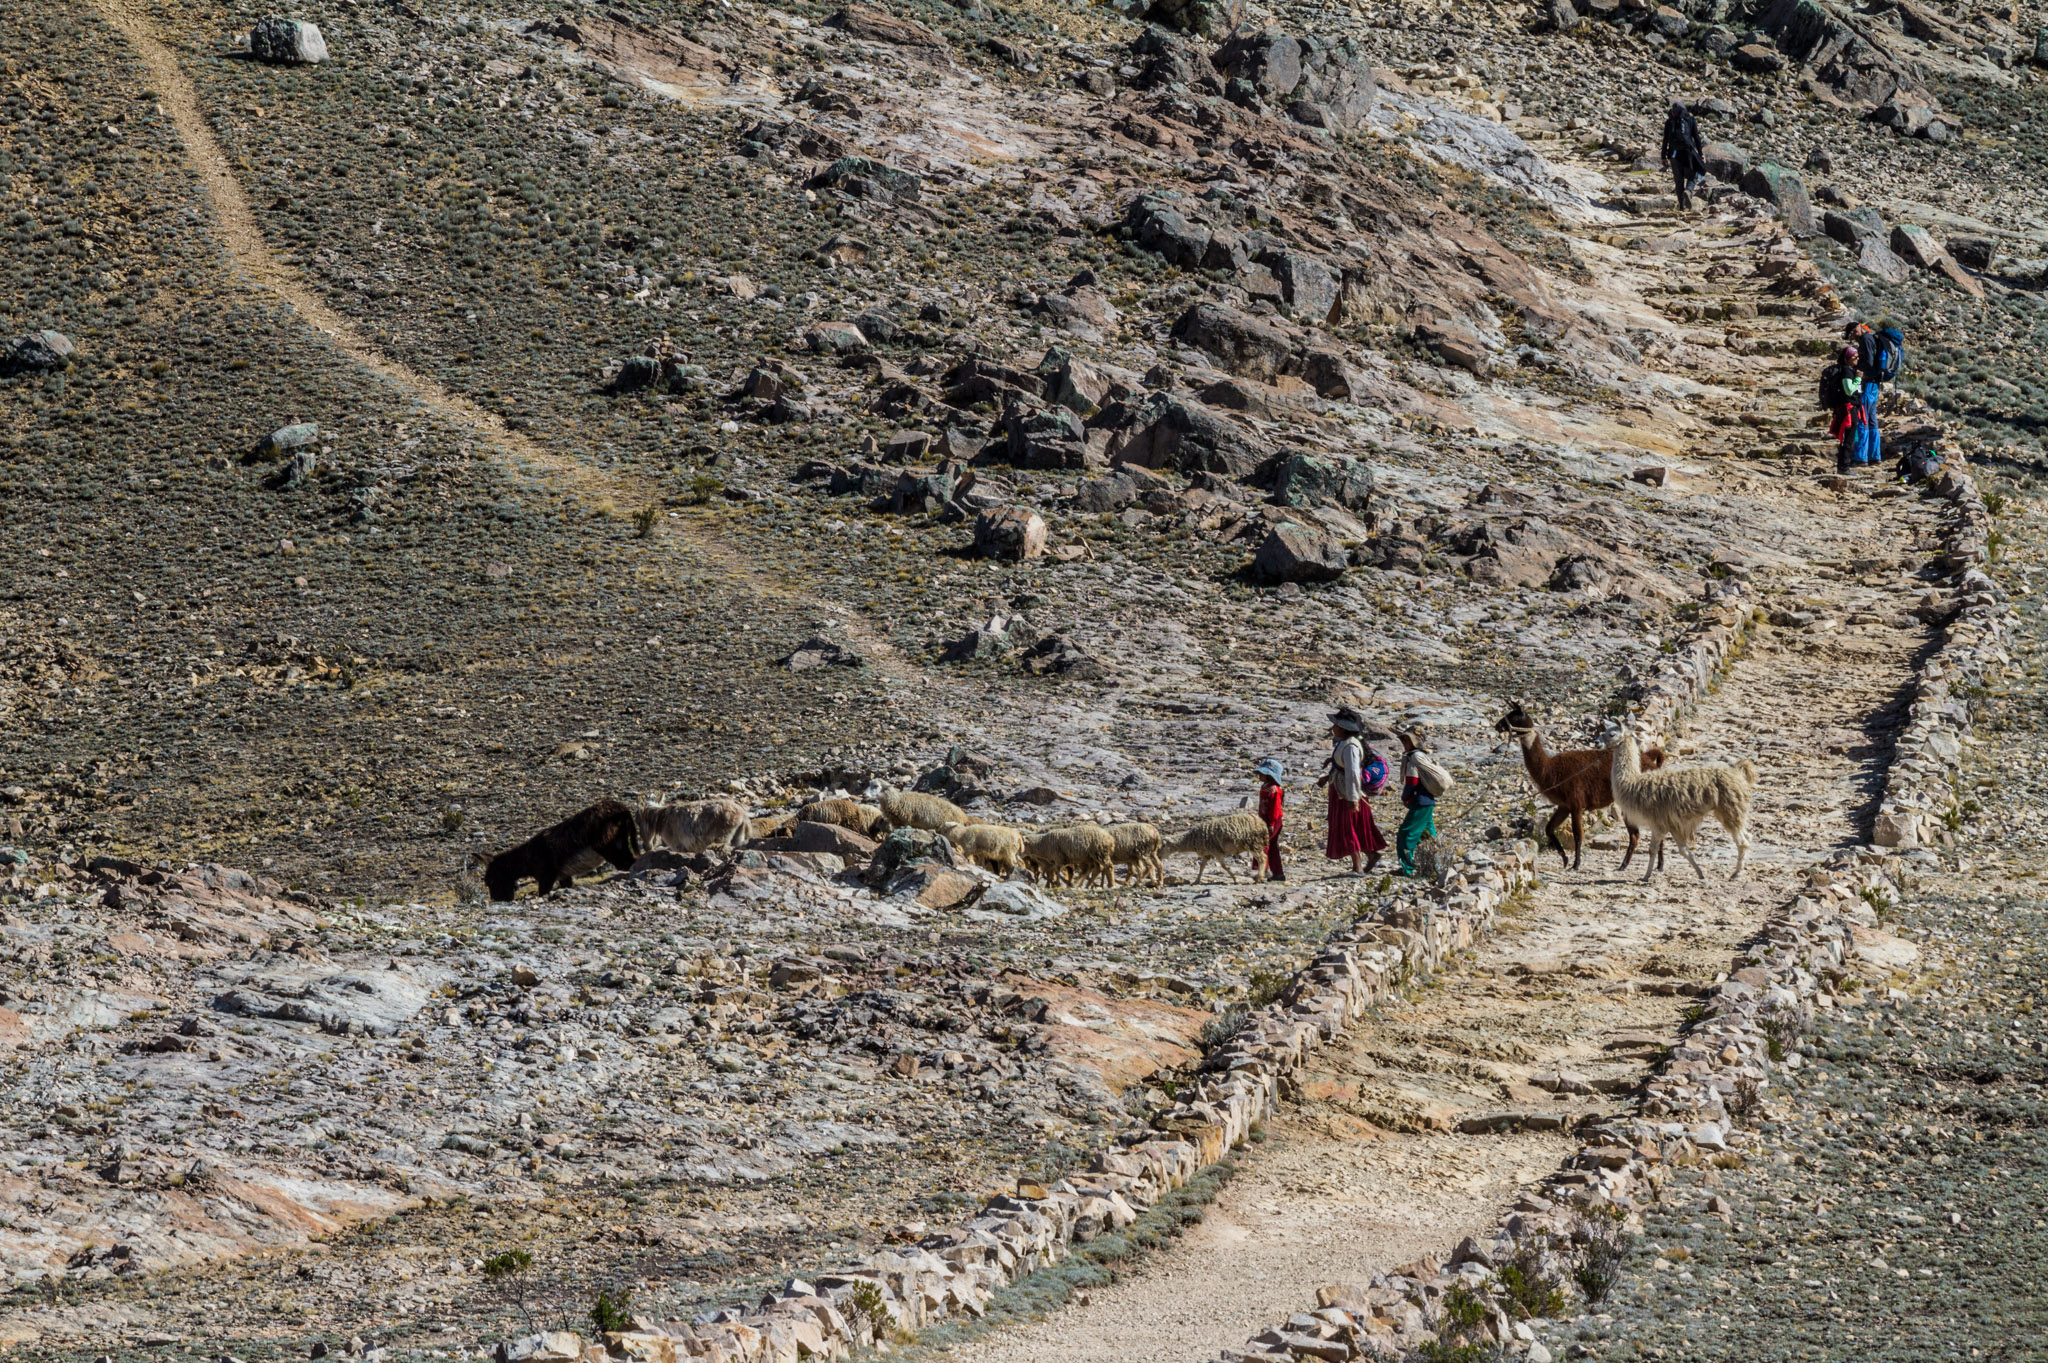 Ali-Barqawi-Studios-Explore-Series-Travel-Adventure-Documentary-C4CGAZA-Bolivia-Lake-Titicaca-2015-050.jpg